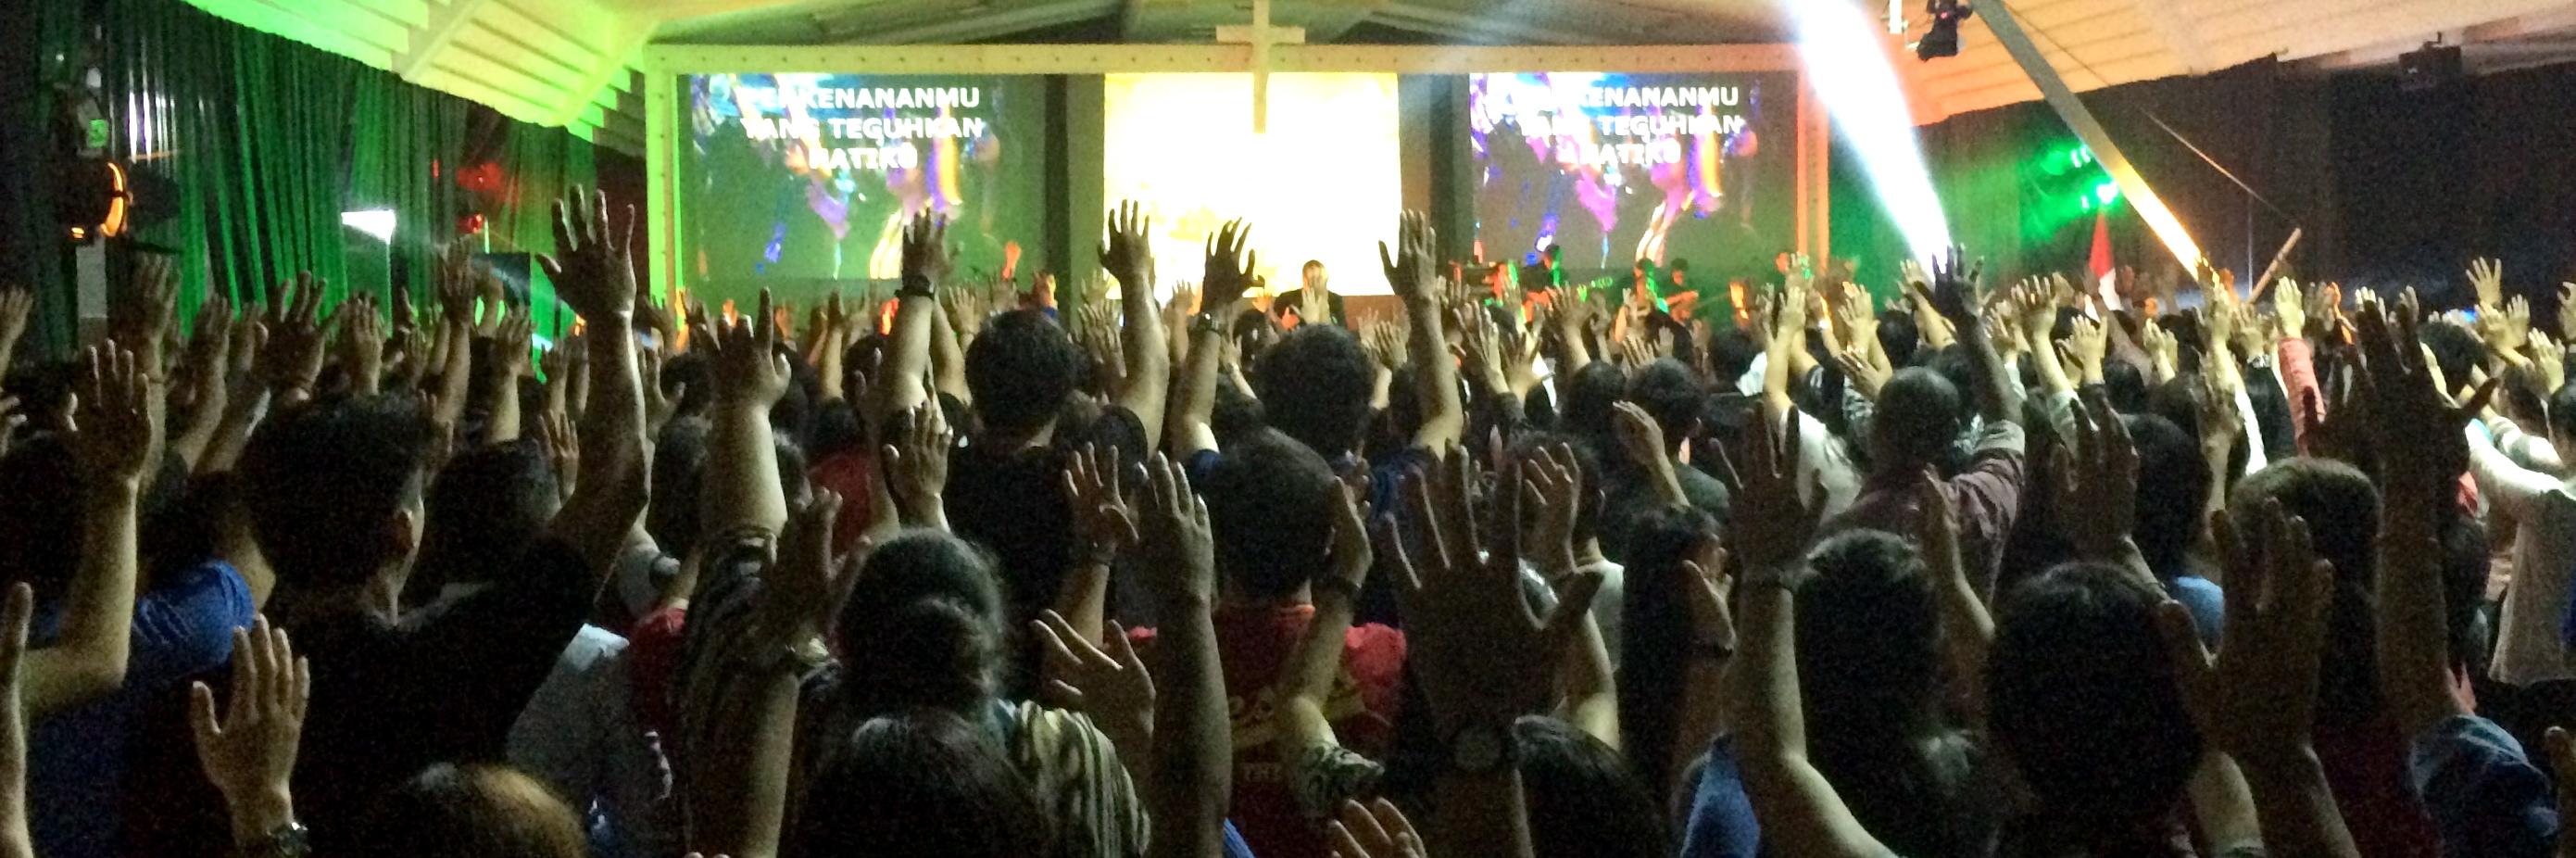 Konvenas Muda Mudi V, Bandung, Okt 2014